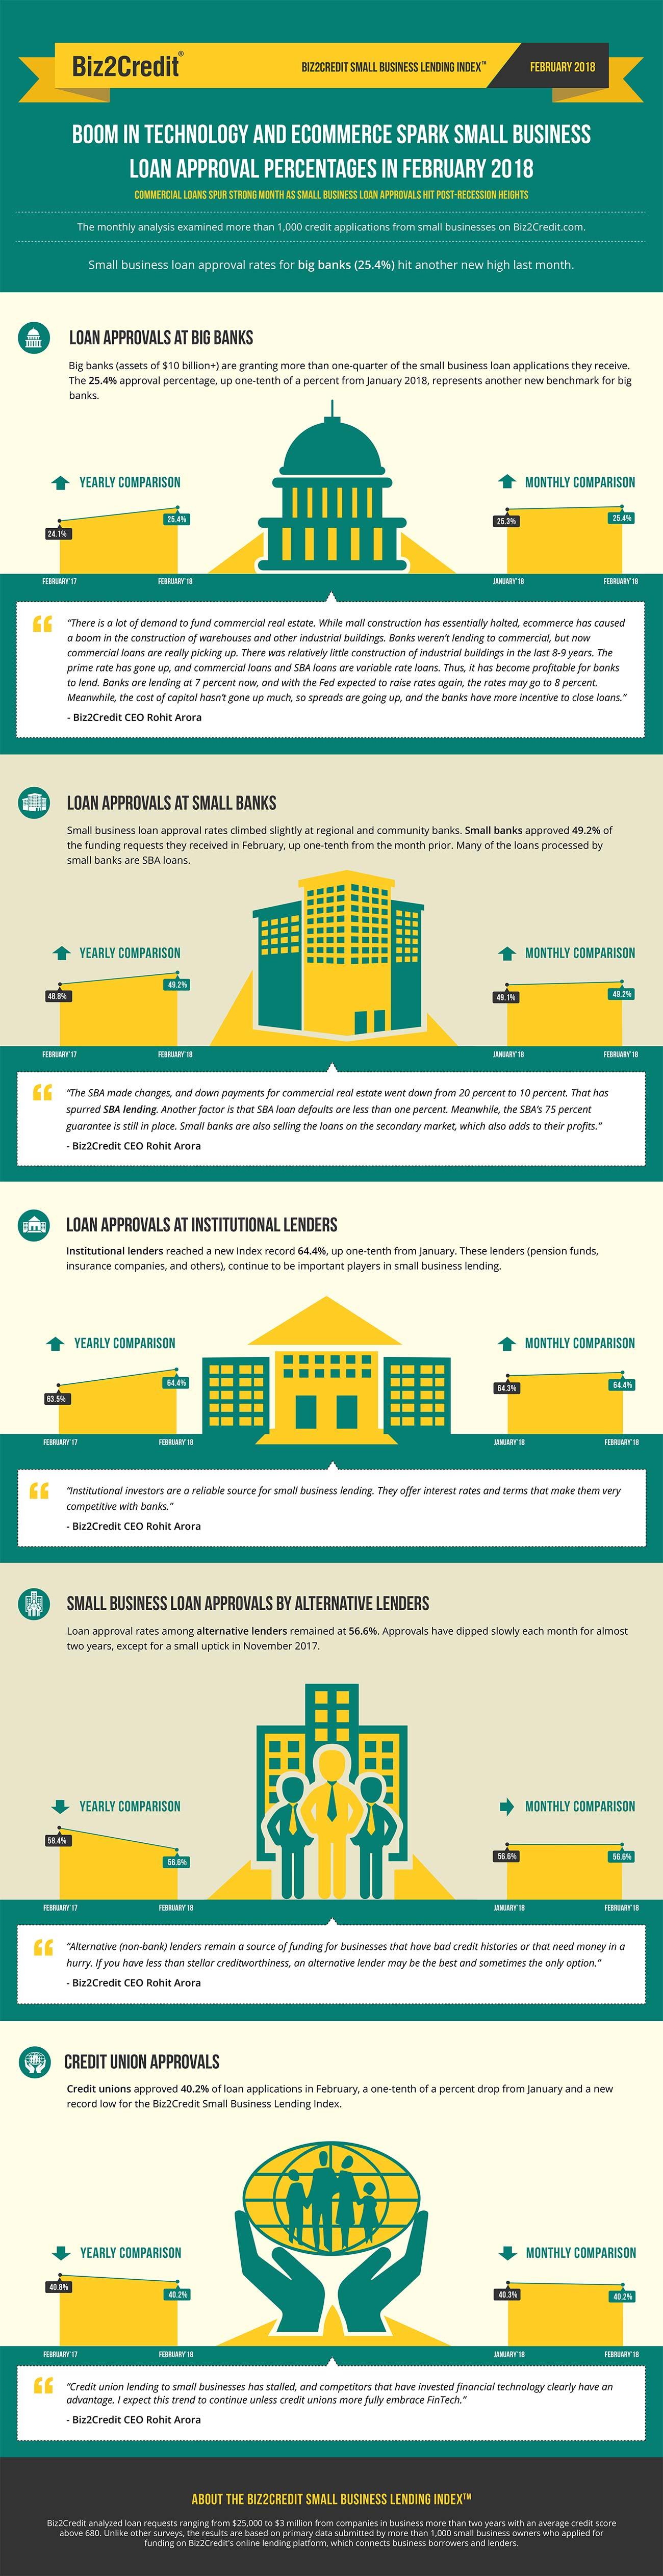 february18 Lending Index Infographic